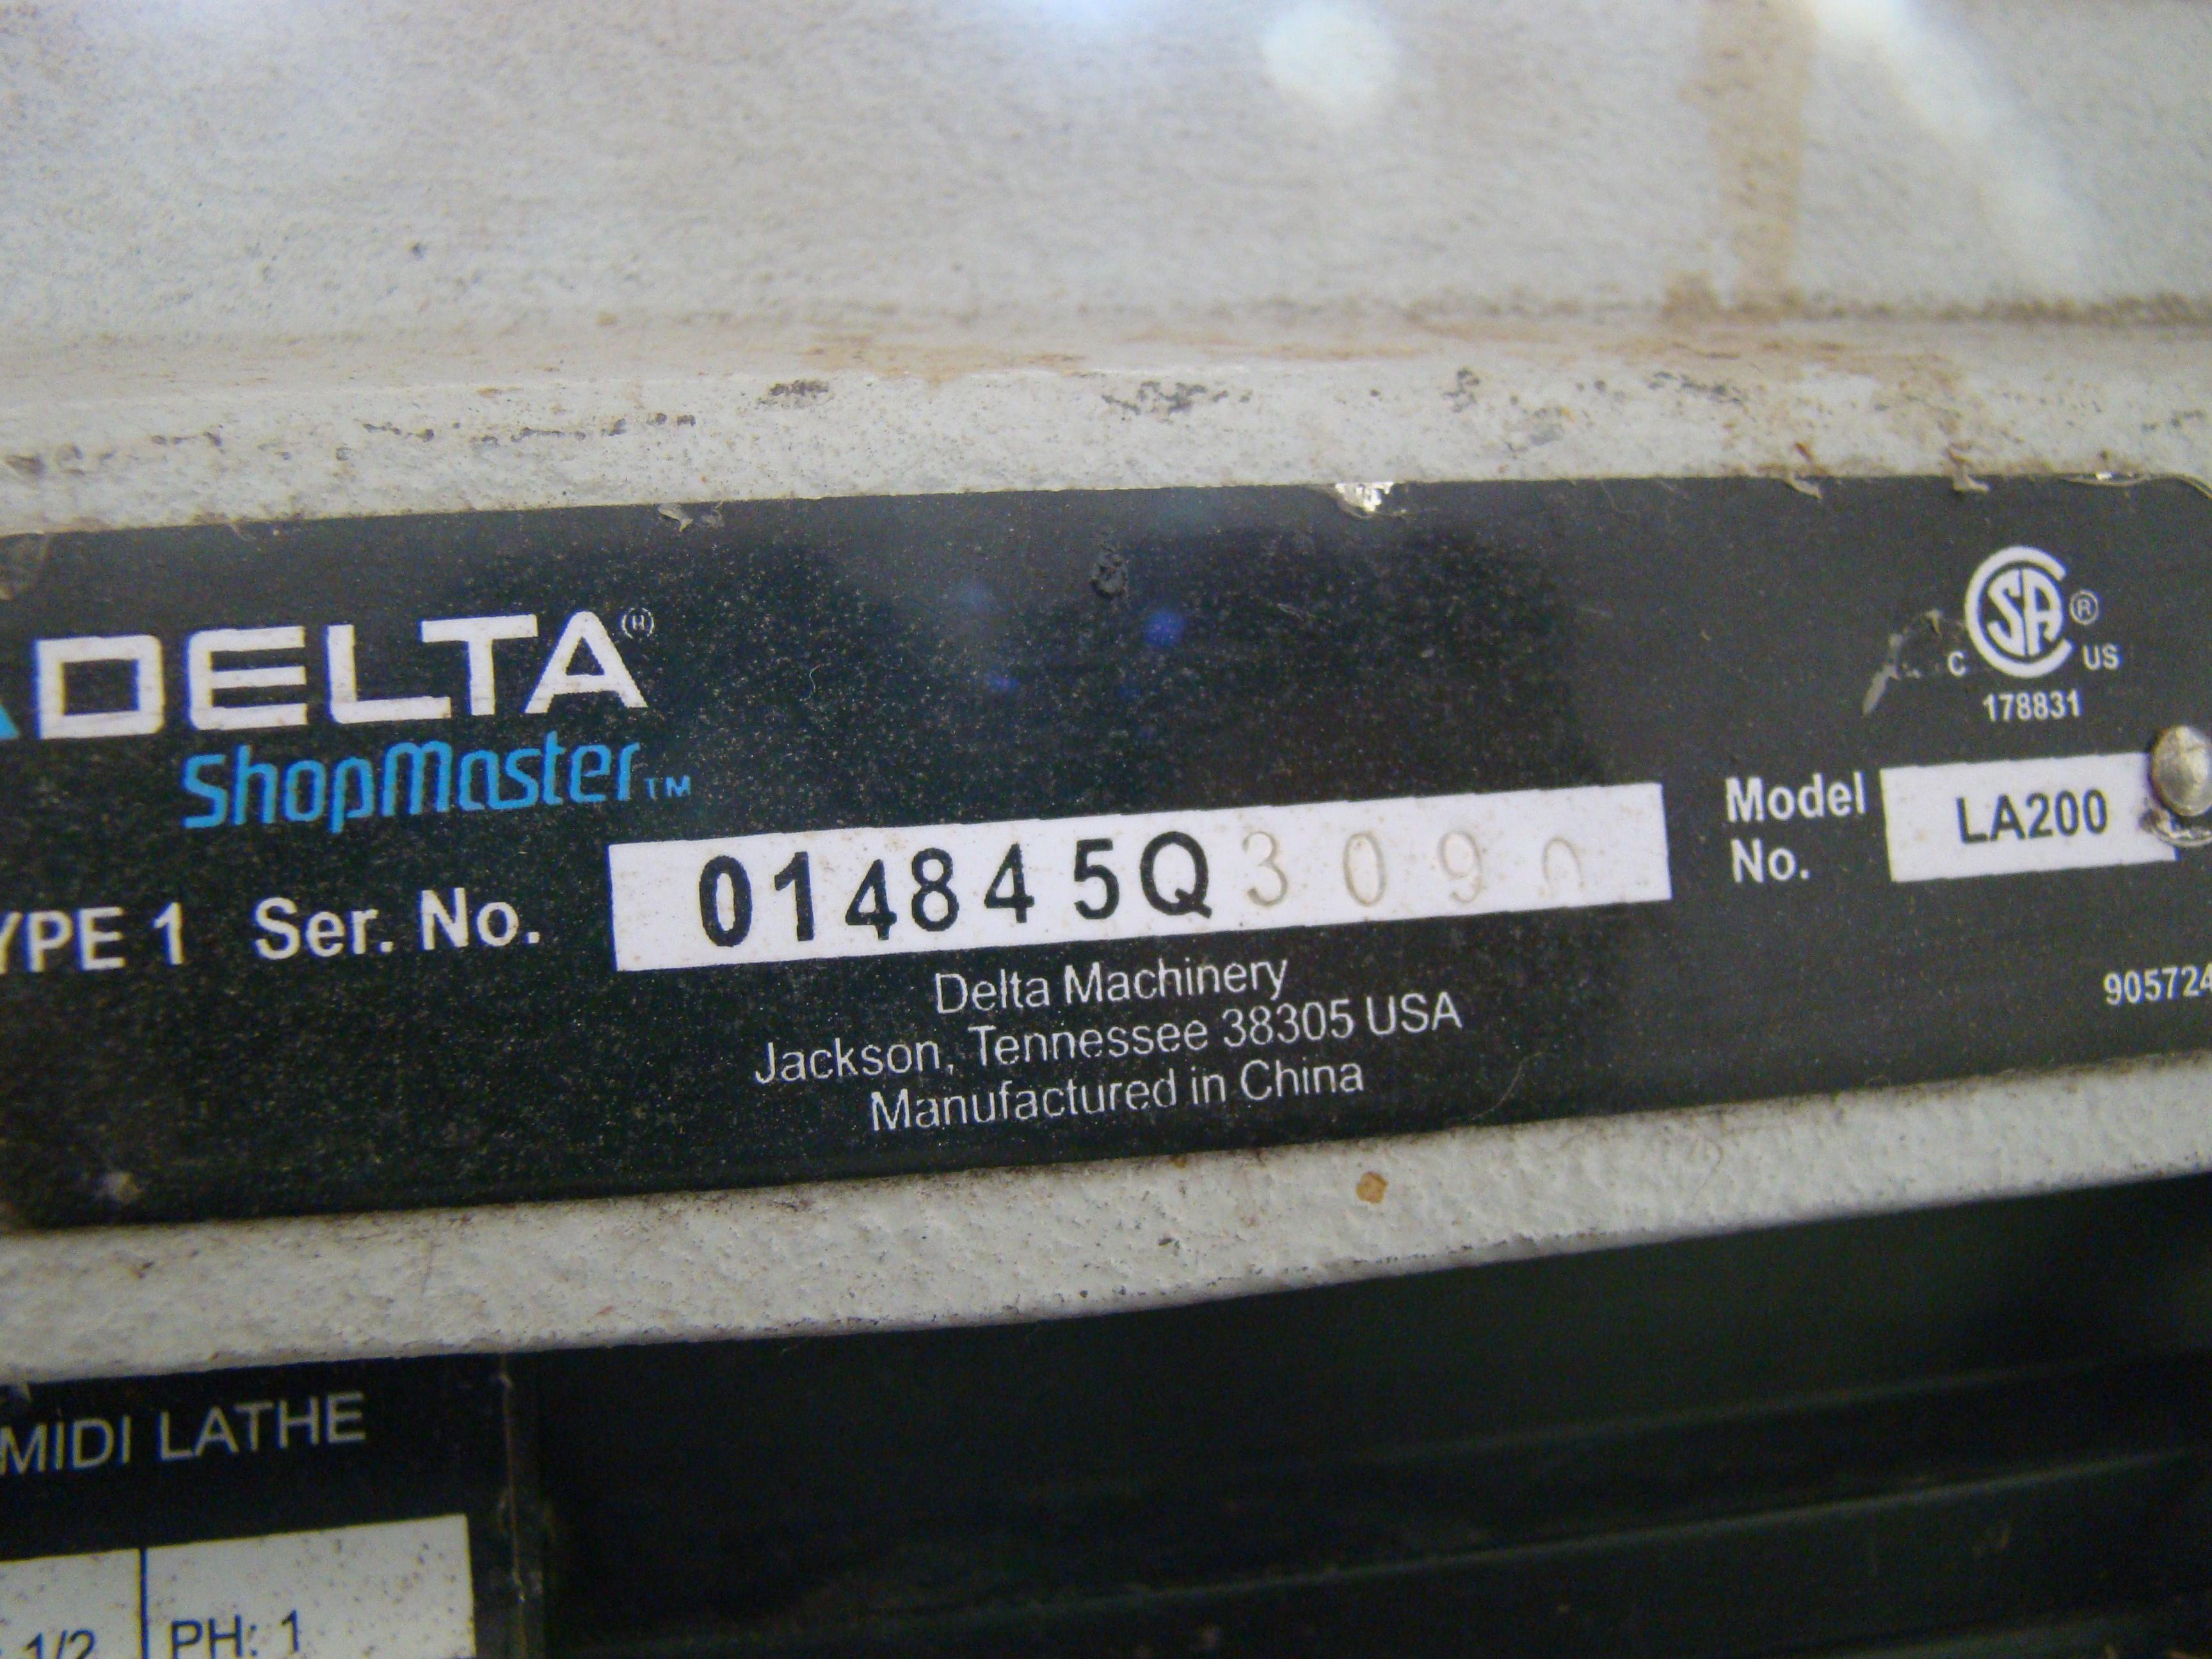 Delta Wood Lathe Model LA200 1/2 HP 120V 1PH - Image 6 of 9